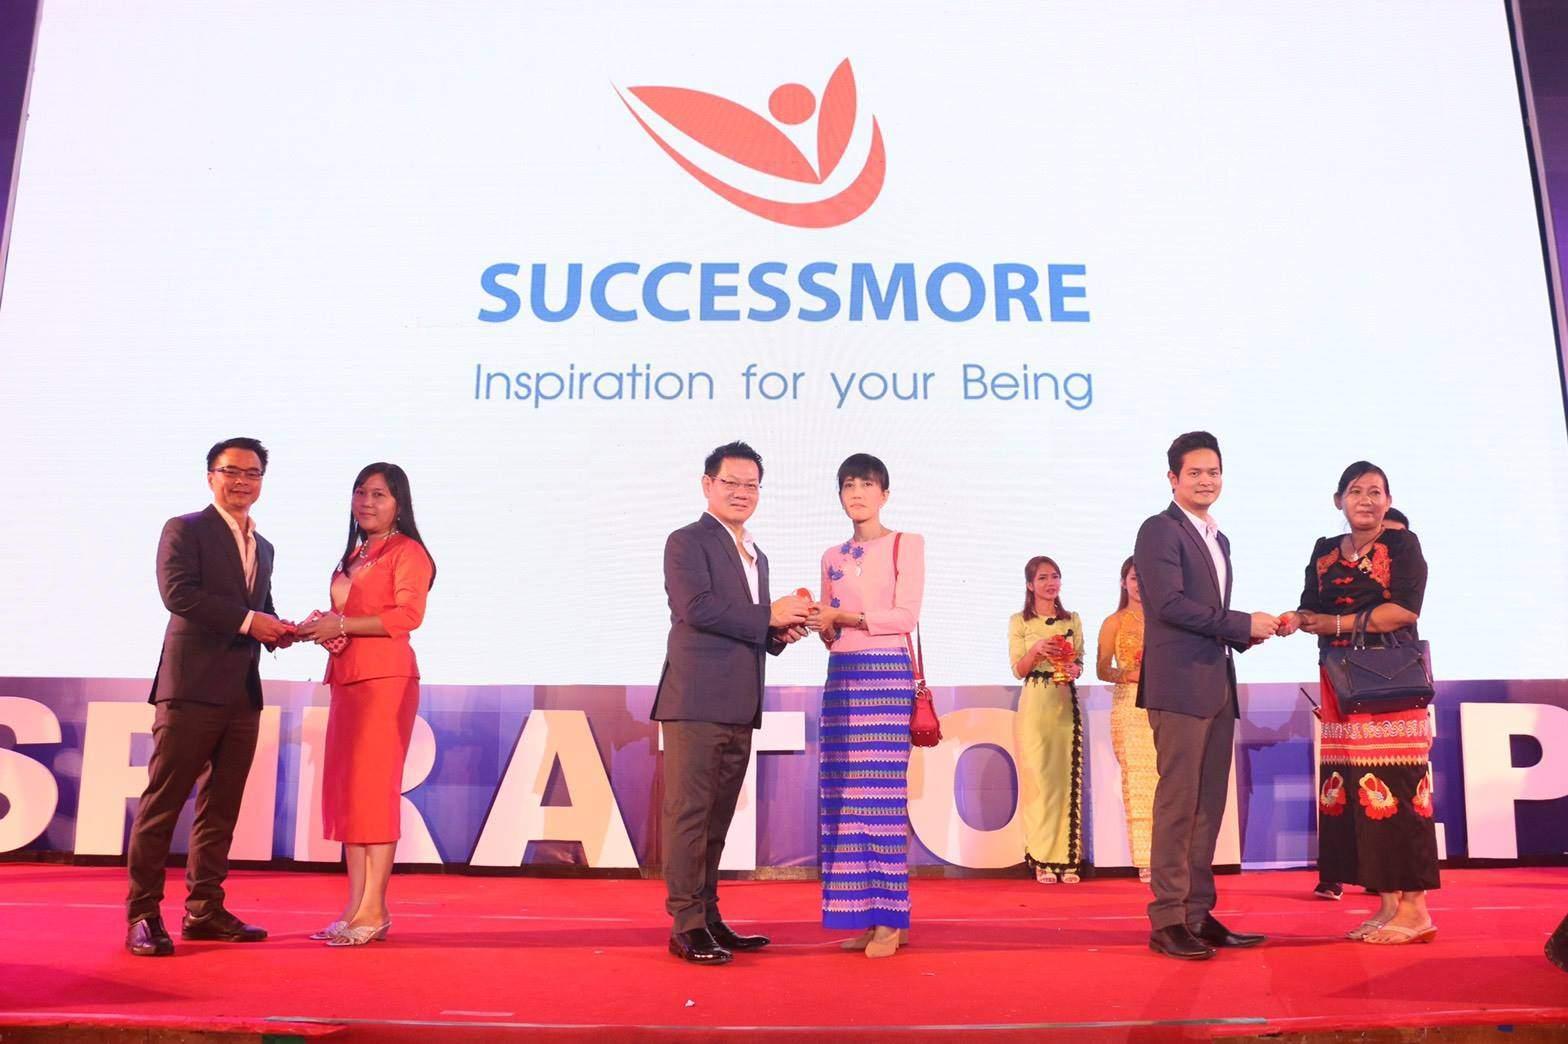 SUCCESSMORE Inspiration ครั้งที่ 17 เมืองย่างกุ้ง ประเทศเมียนมาร์ (4)